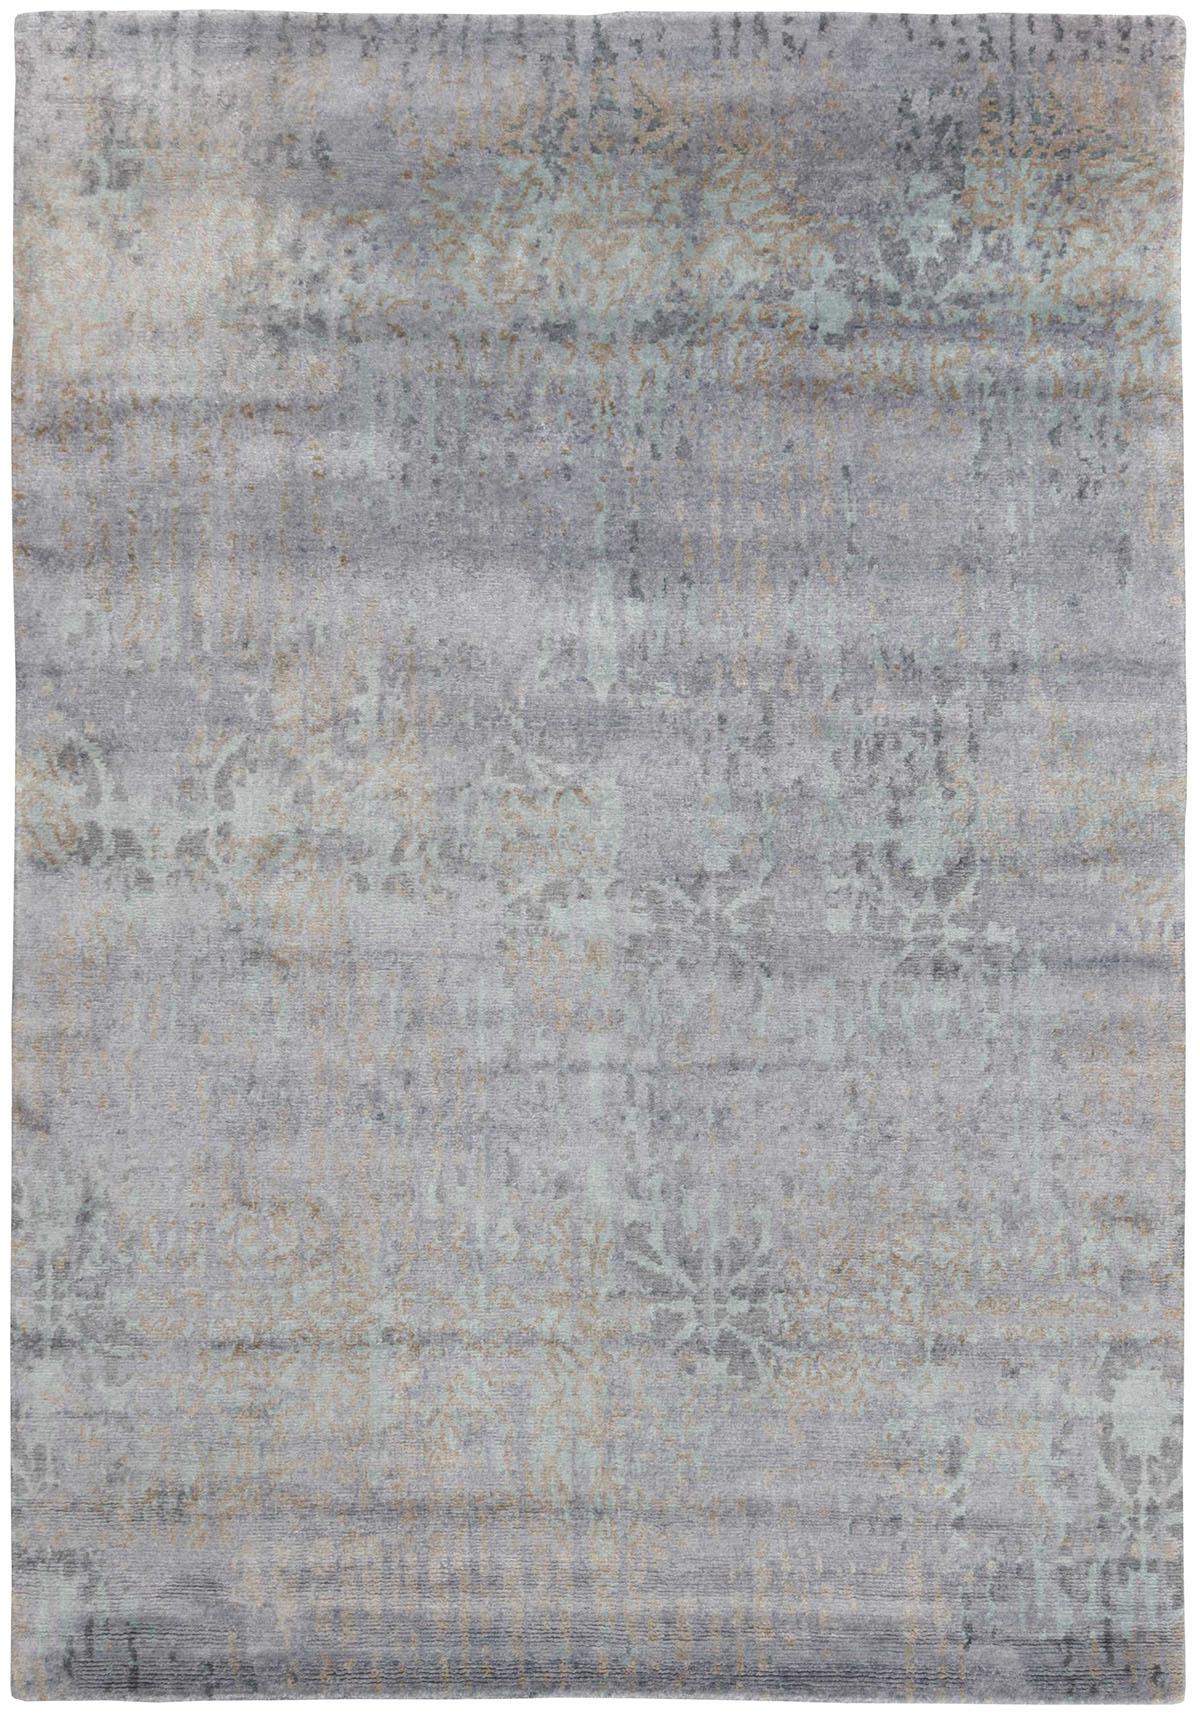 fioletowy dywan ekskluzywny - Temptation 6705